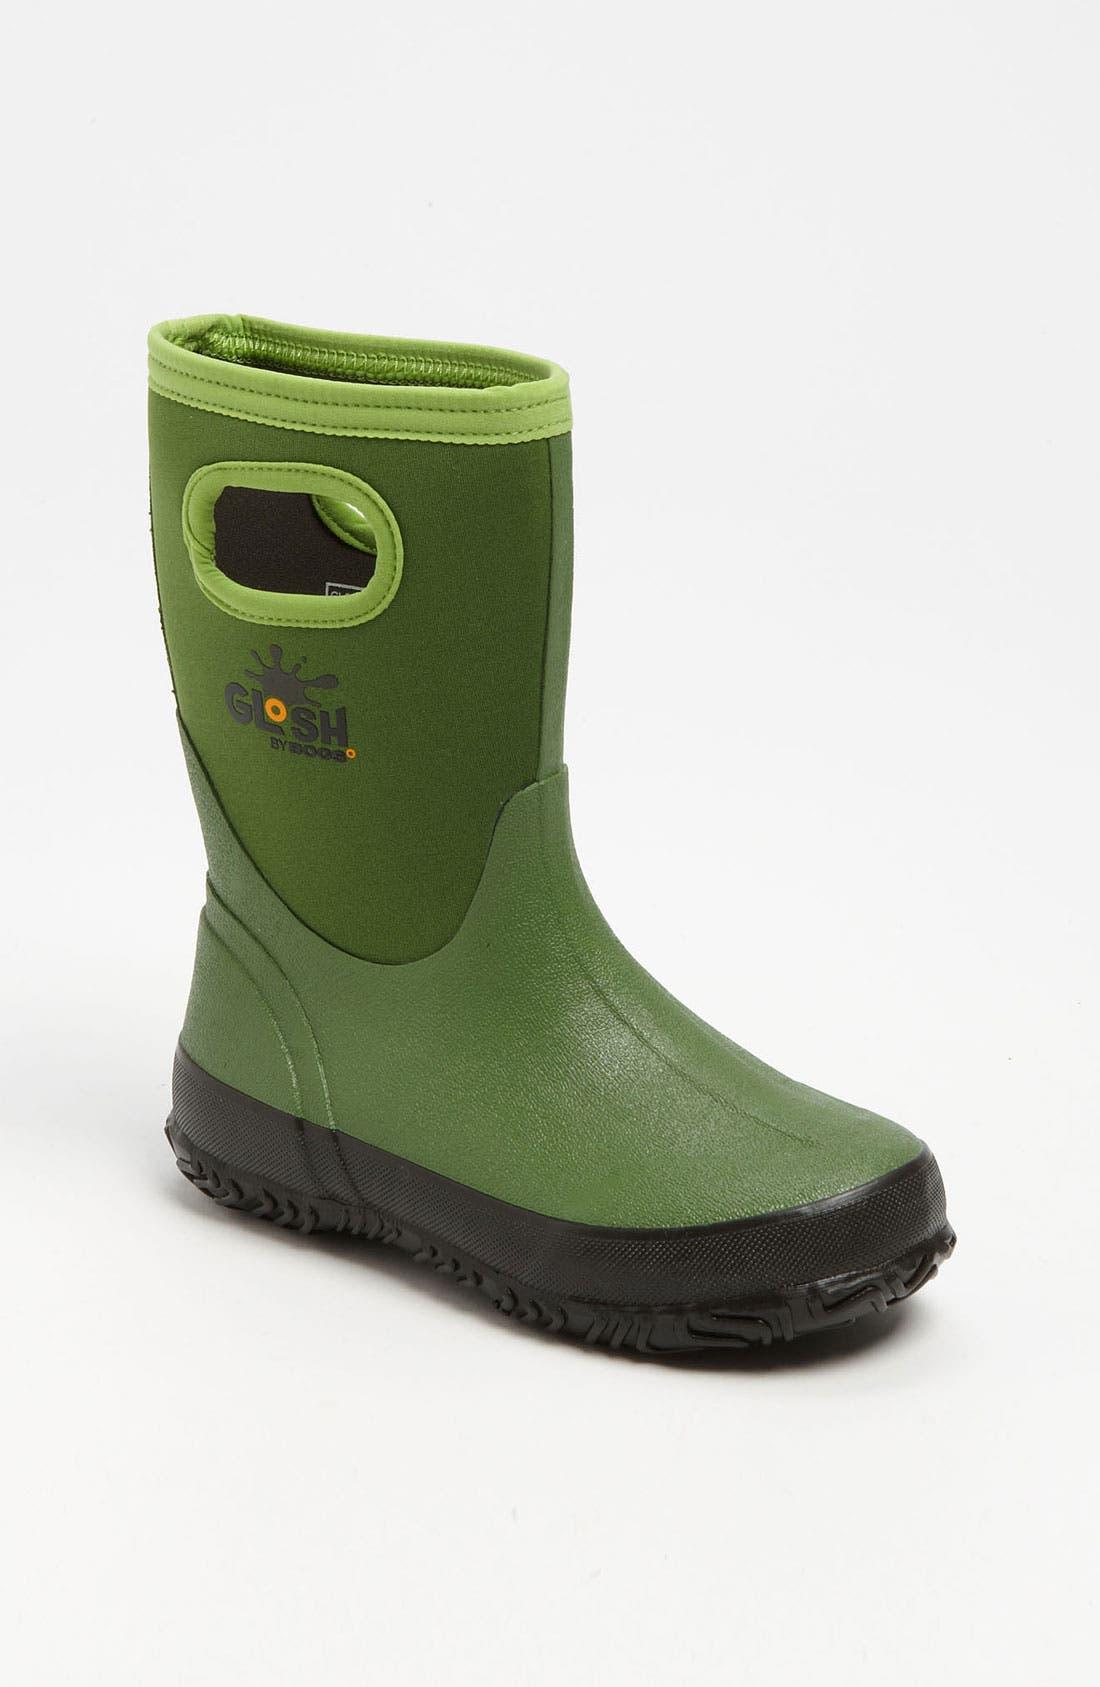 Main Image - Bogs 'Glosh' Rain Boot (Toddler, Little Kid & Big Kid)